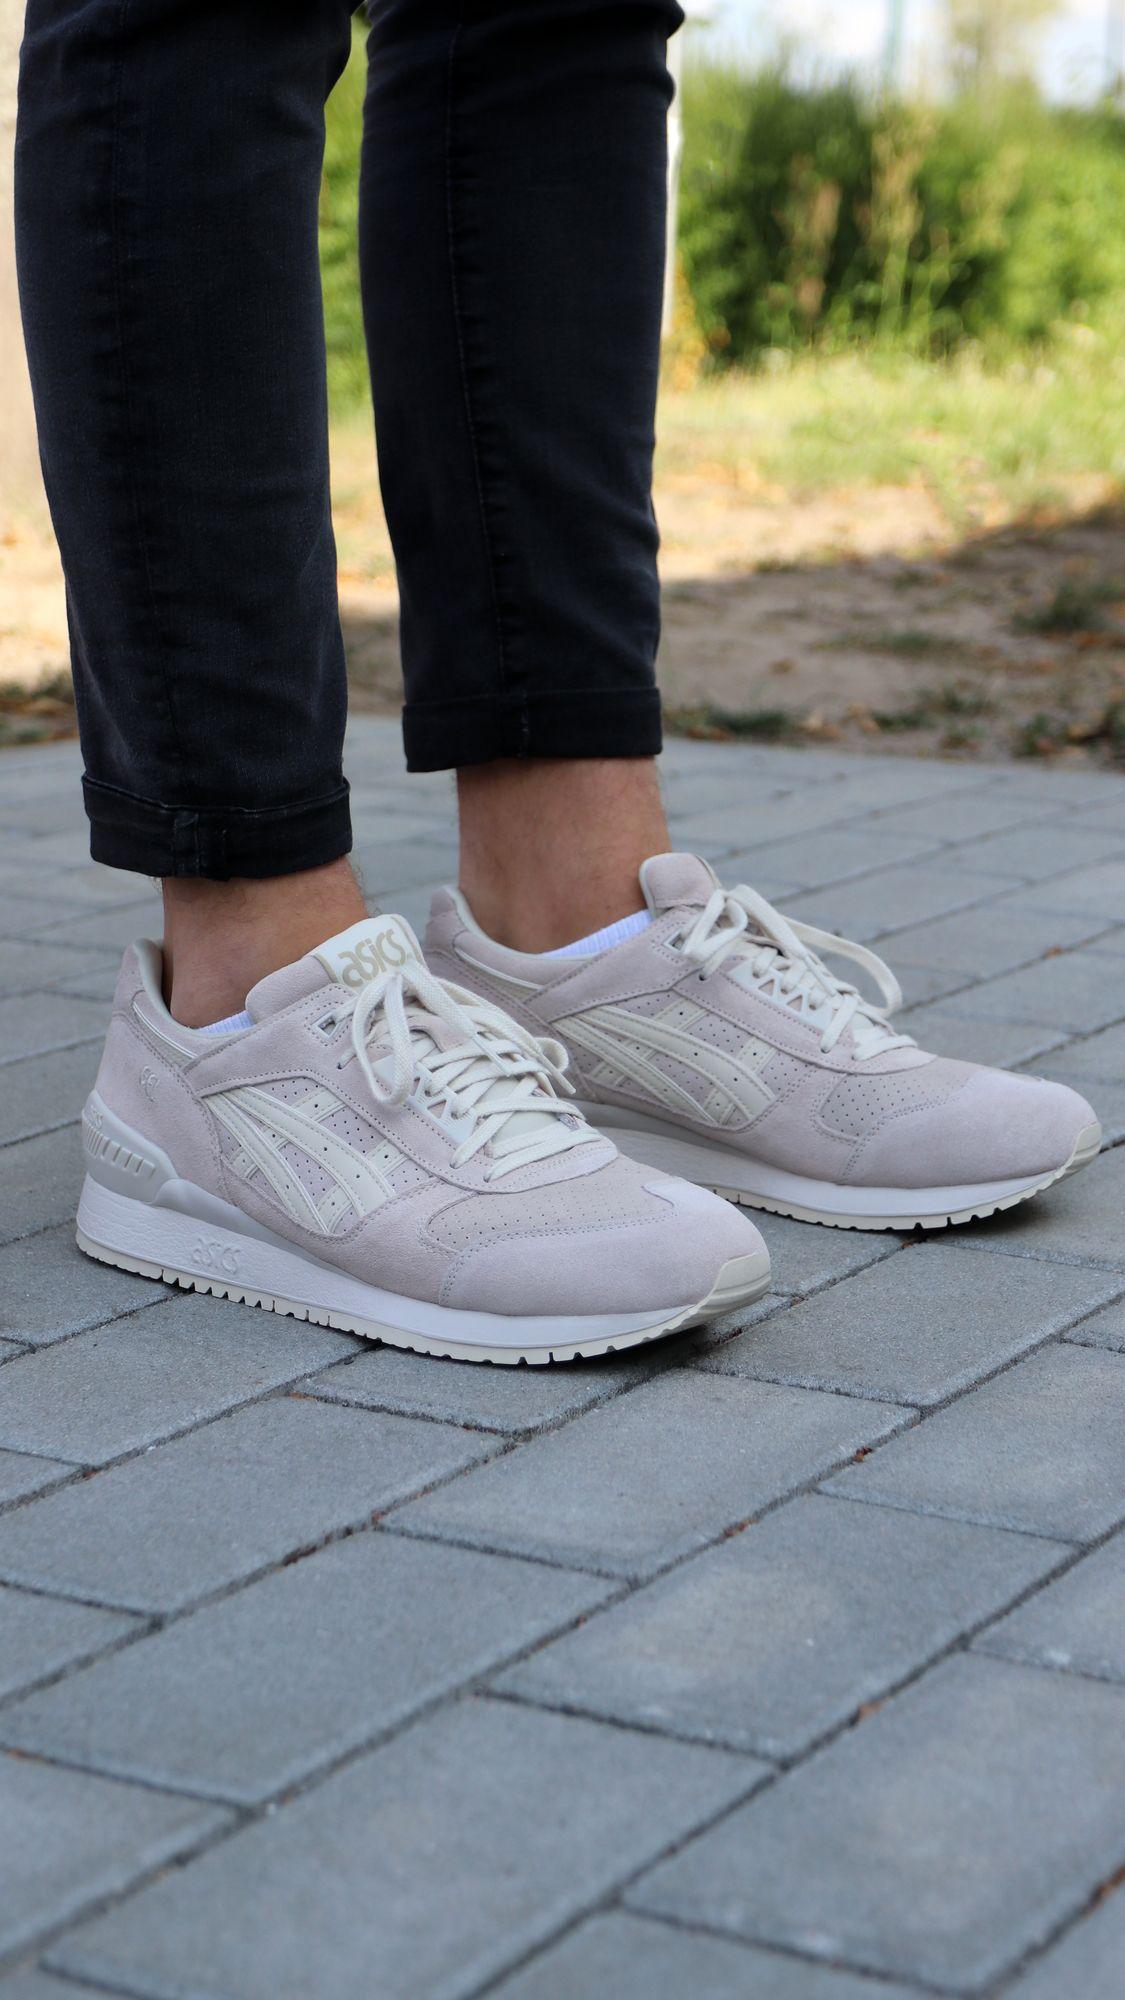 ASICS Tiger GEL Respector Sneaker | Sneaker, Asics tiger